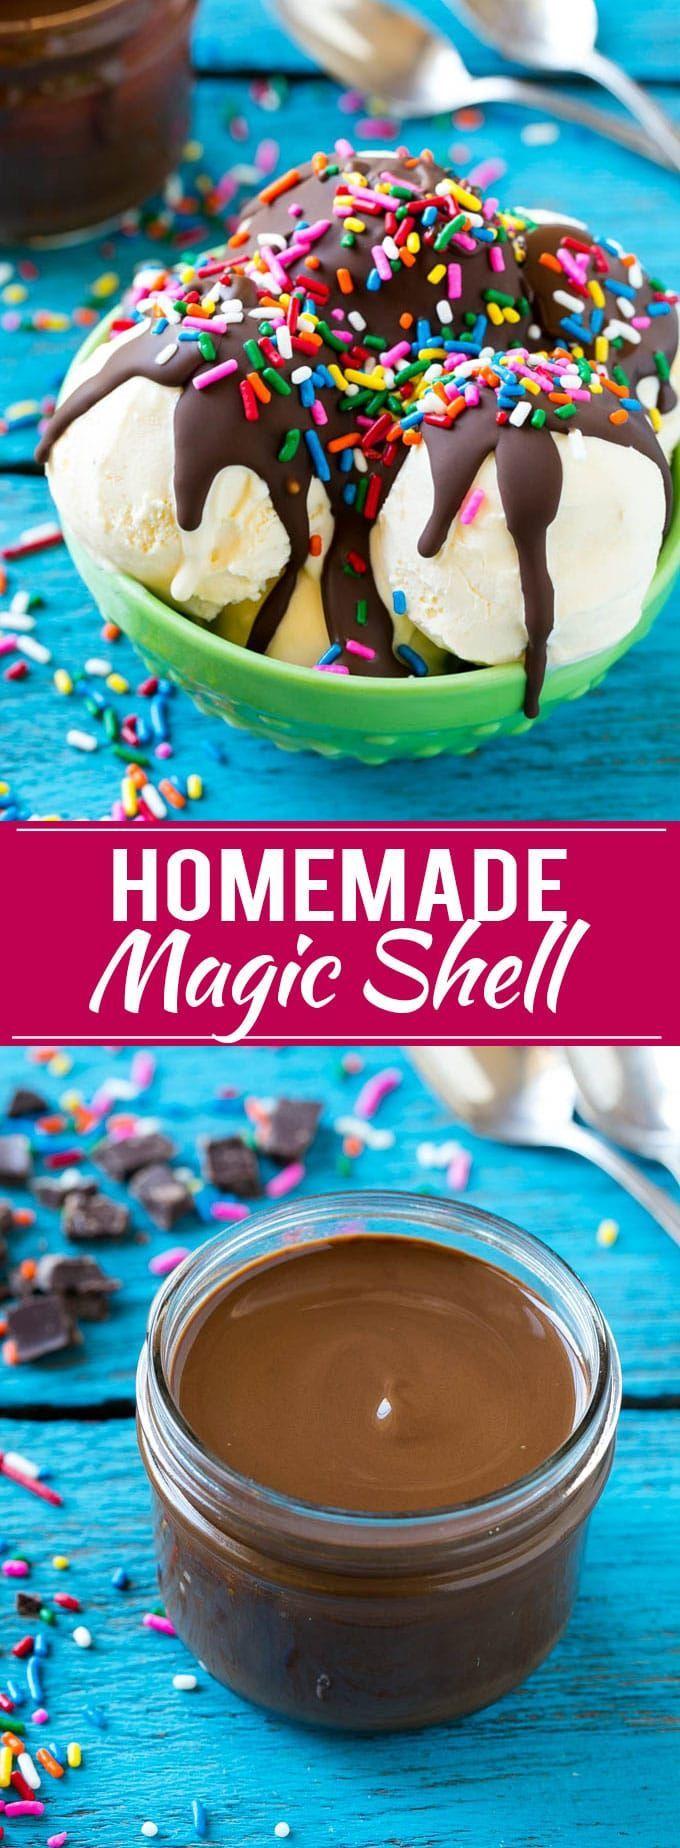 Homemade Magic Shell Recipe | Chocolate Ice Cream Topping | Chocolate Sauce | Hard Chocolate Coating